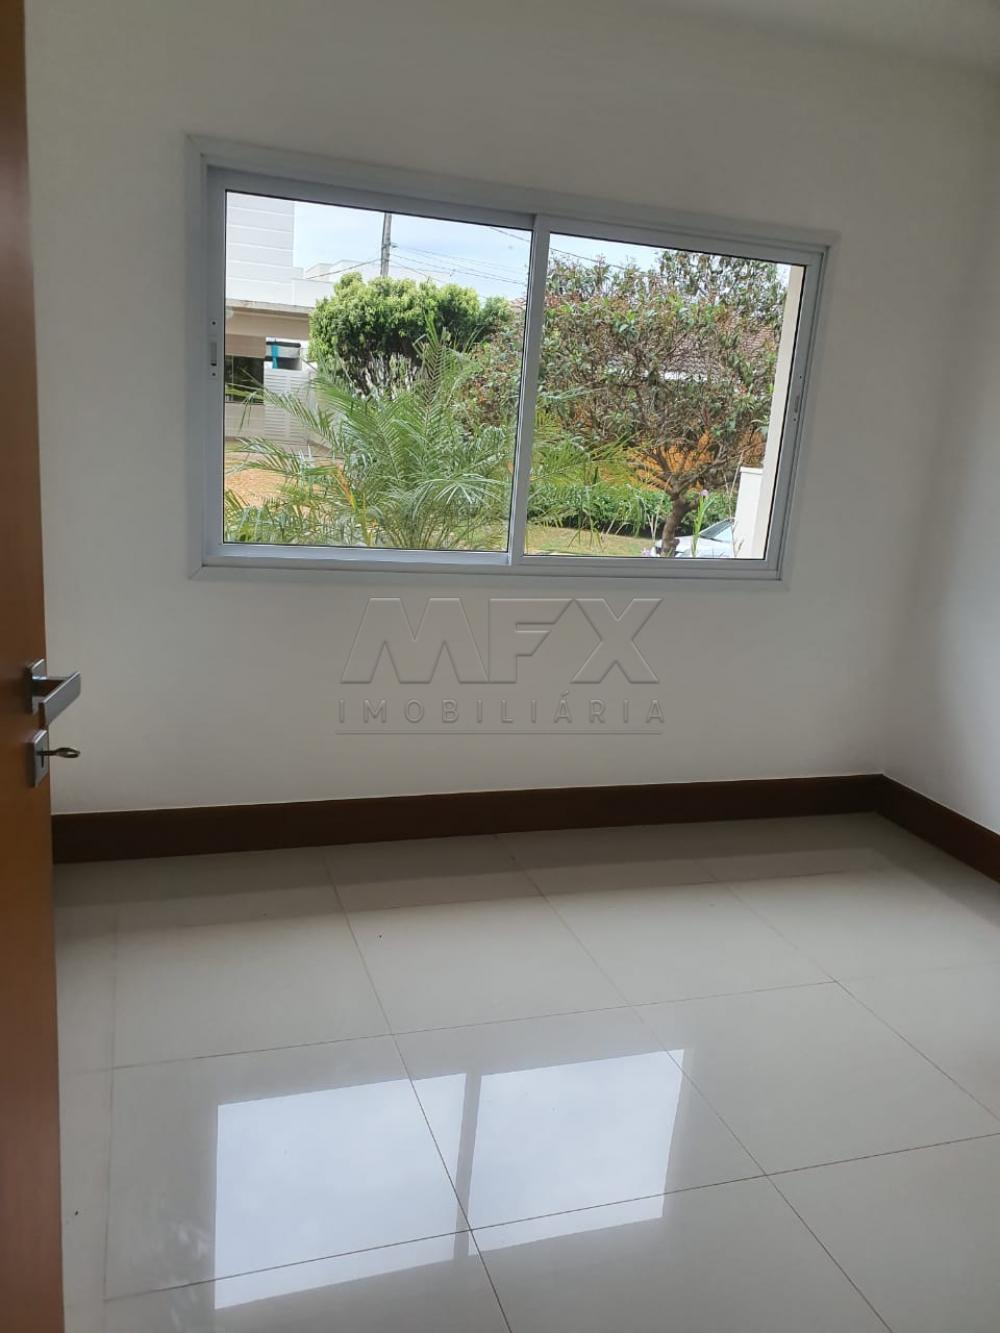 Alugar Casa / Condomínio em Bauru apenas R$ 6.800,00 - Foto 11